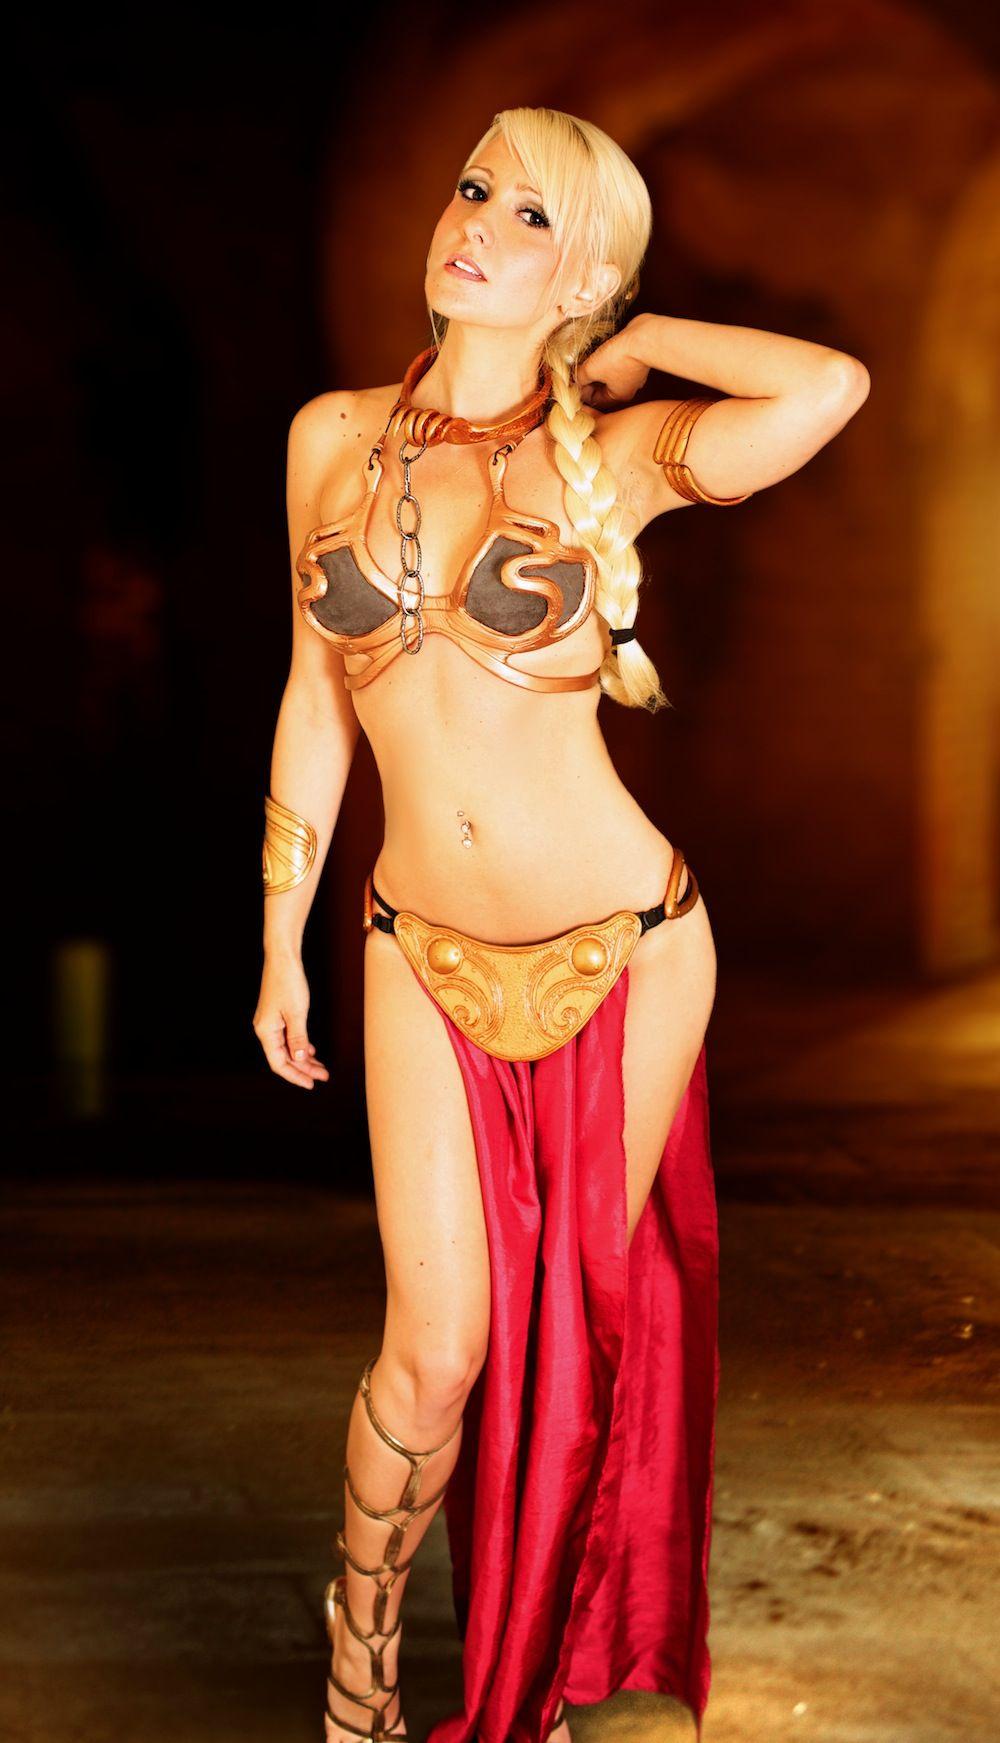 cosplay erotica madchen